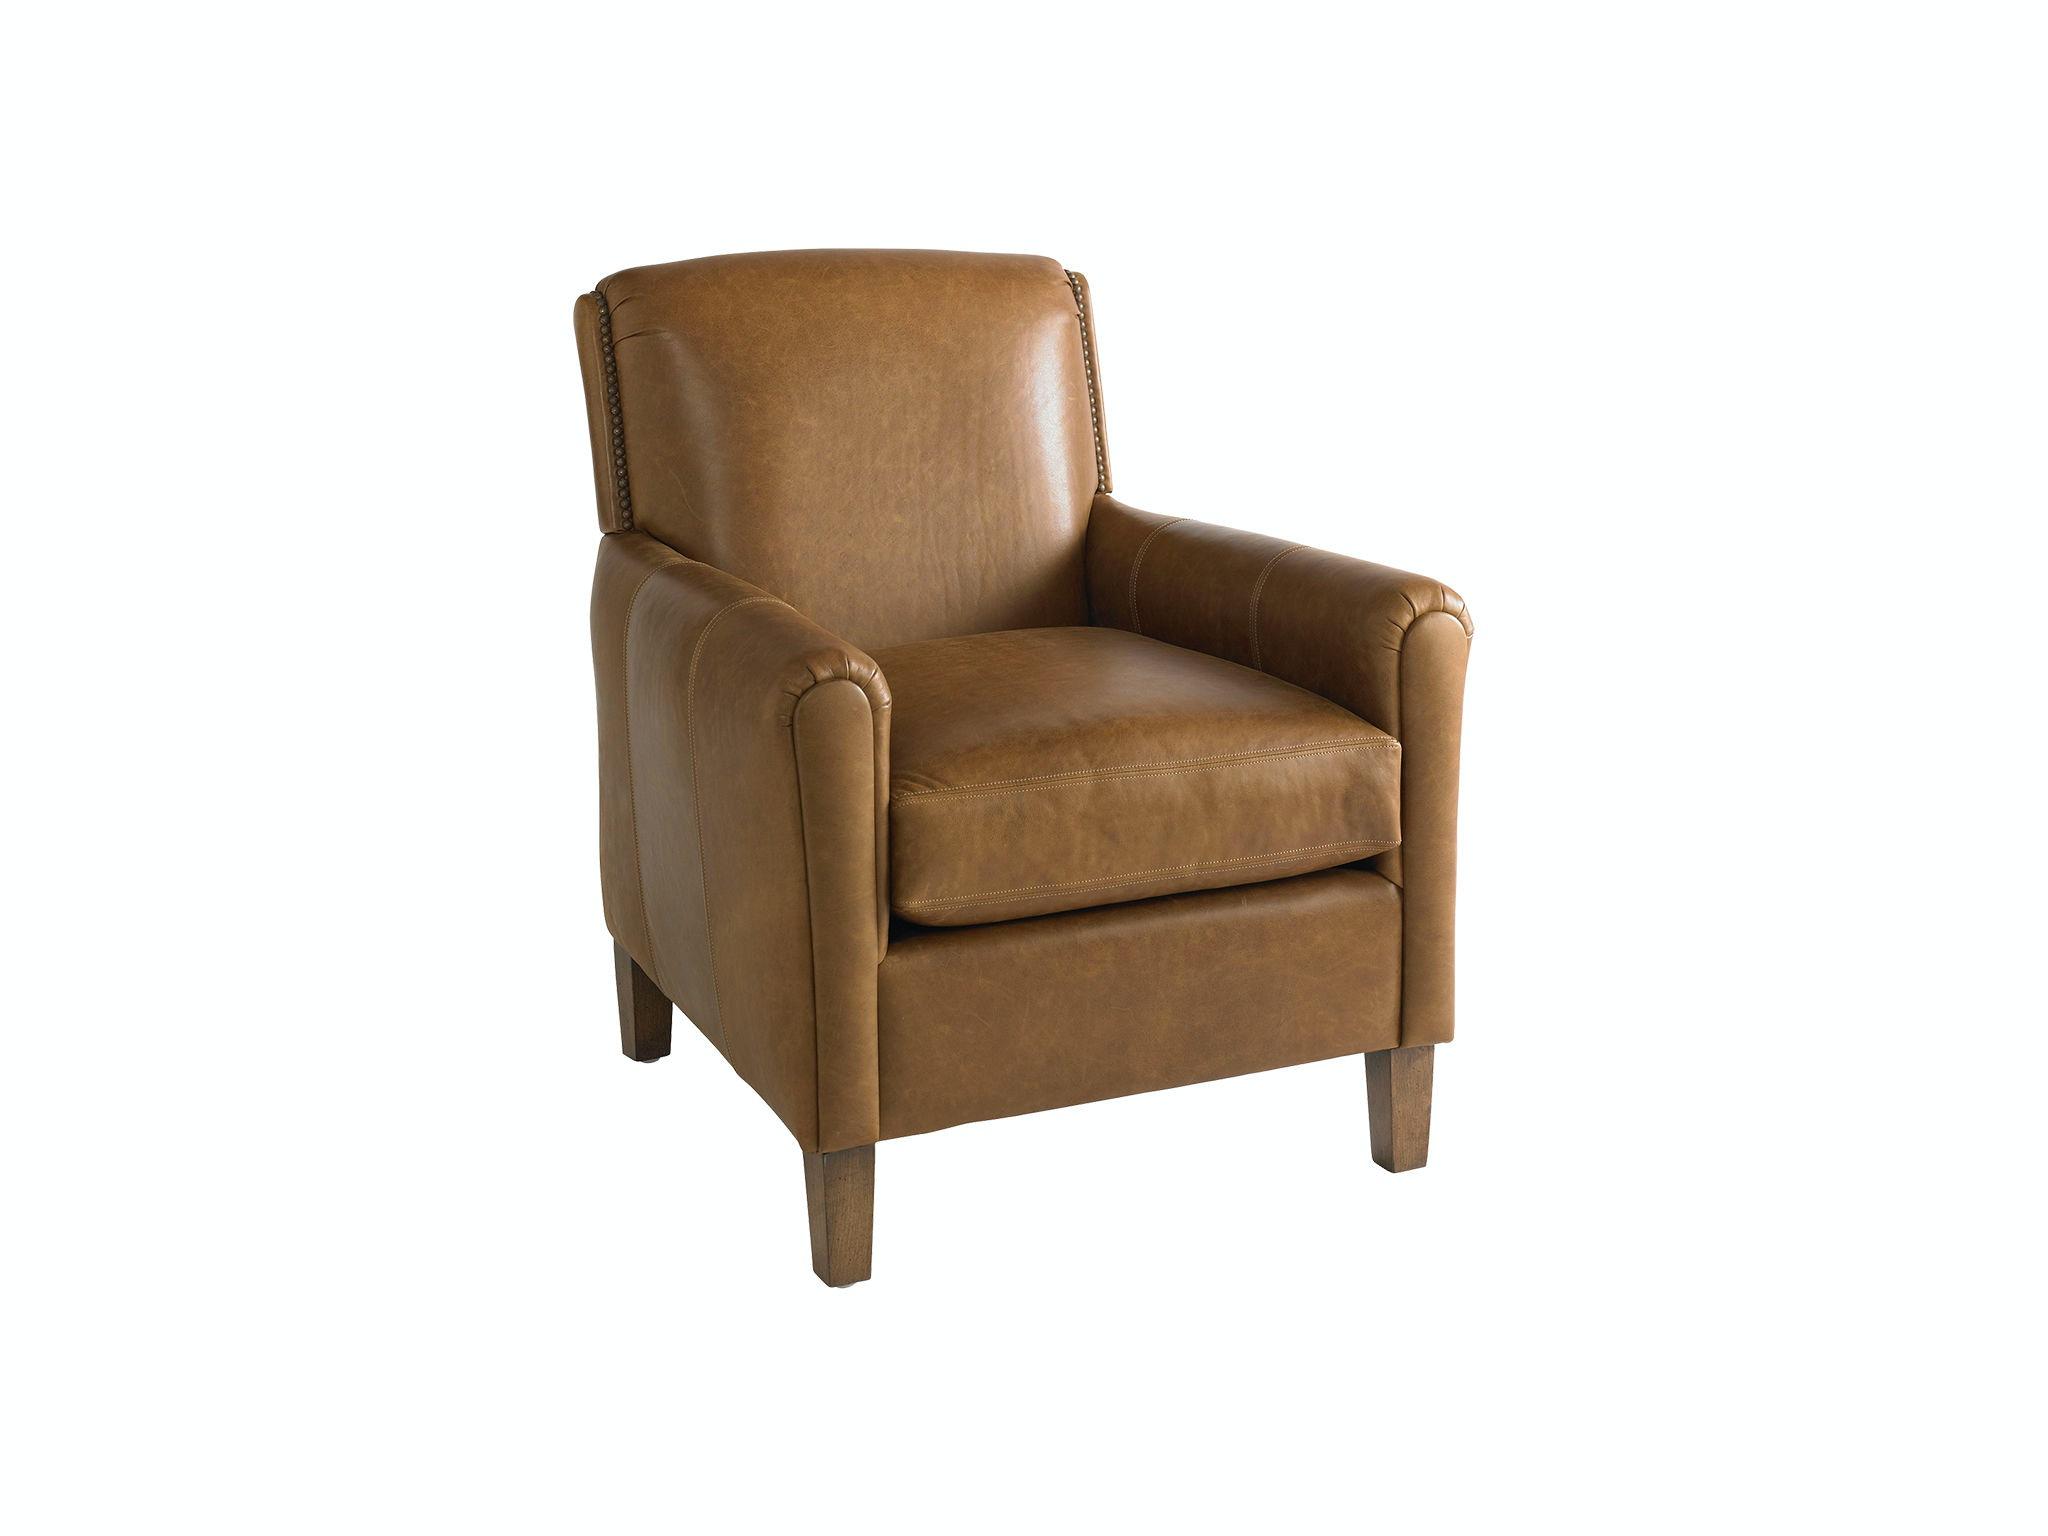 bassett furniture chairs wide recliner chair living room accent 1108 02 kalin home